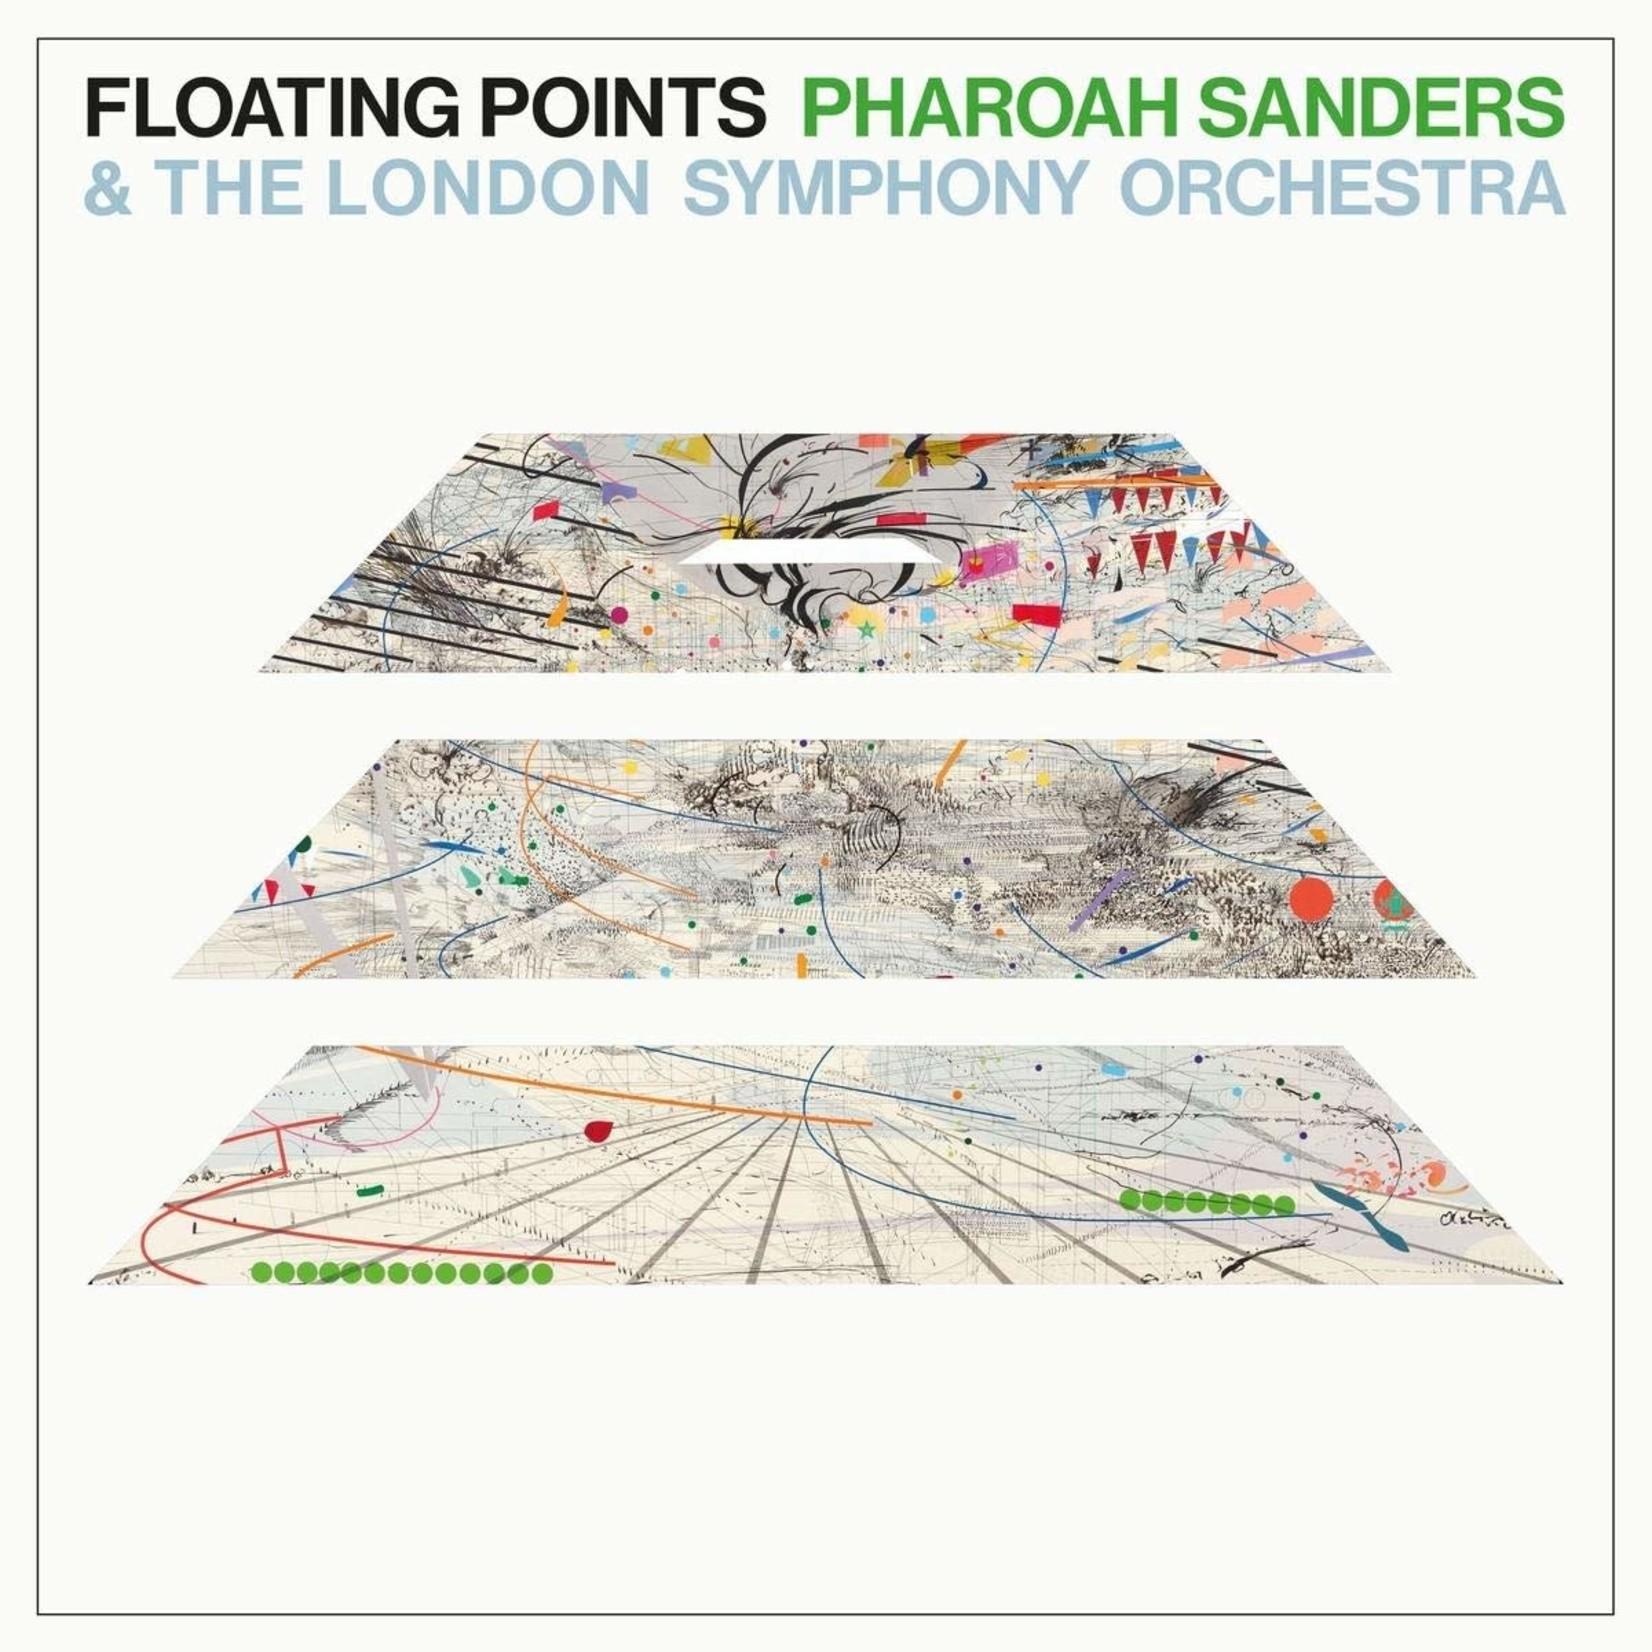 [New] Floating Points, Pharoah Sanders & the London Symphony Orchestra: Promises (Limited Ed., 180g, gatefold)